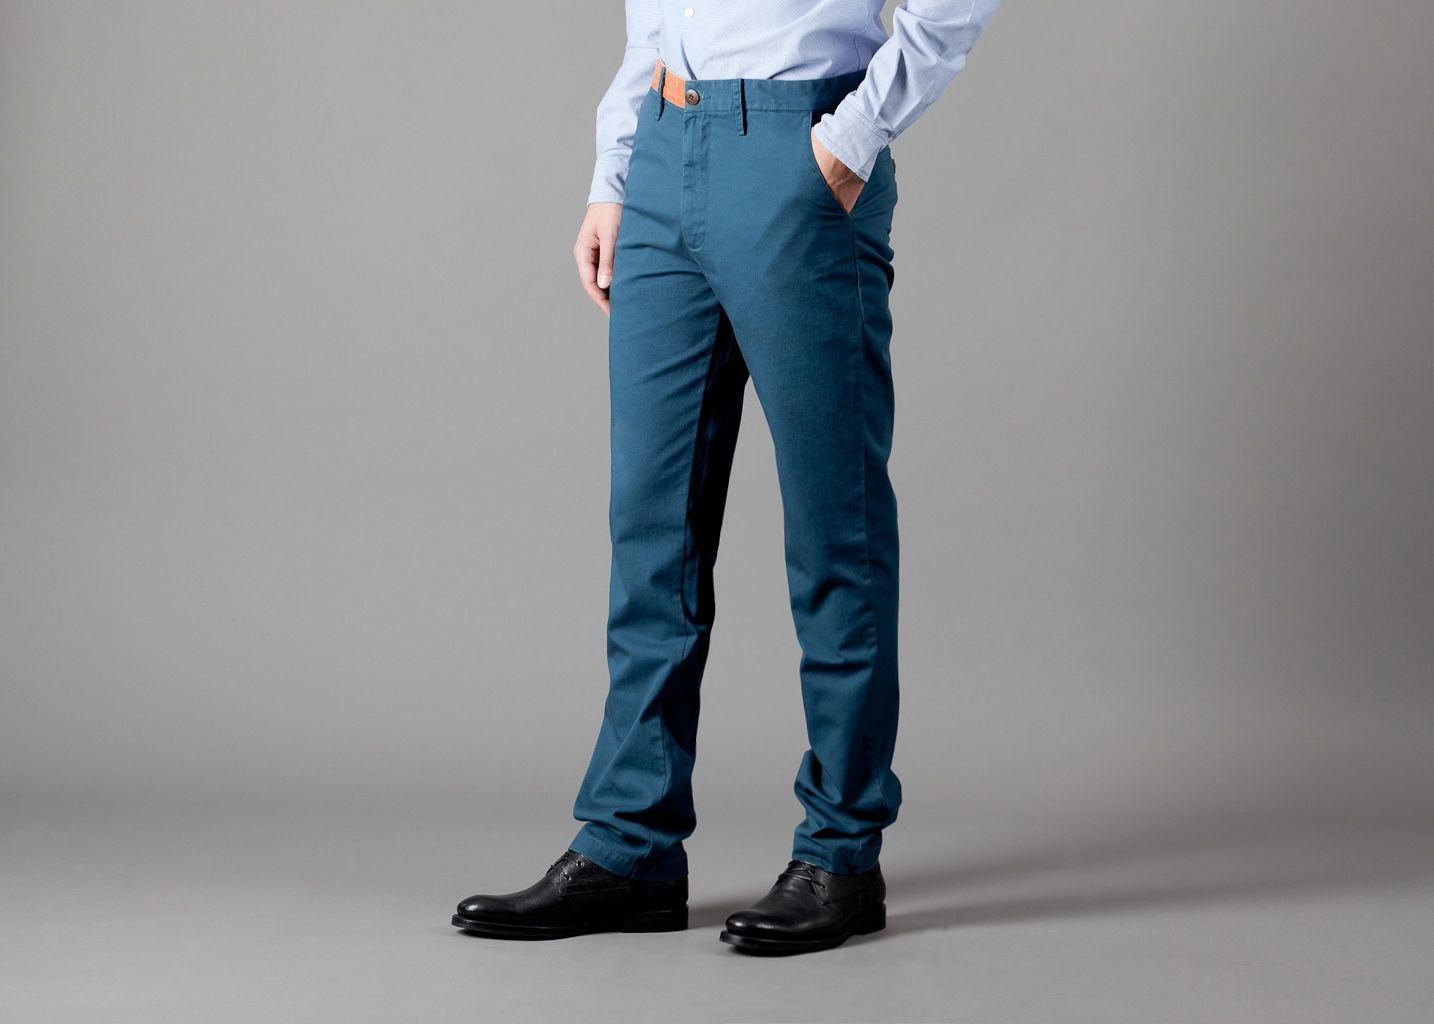 Pantalon Bam - Etudes